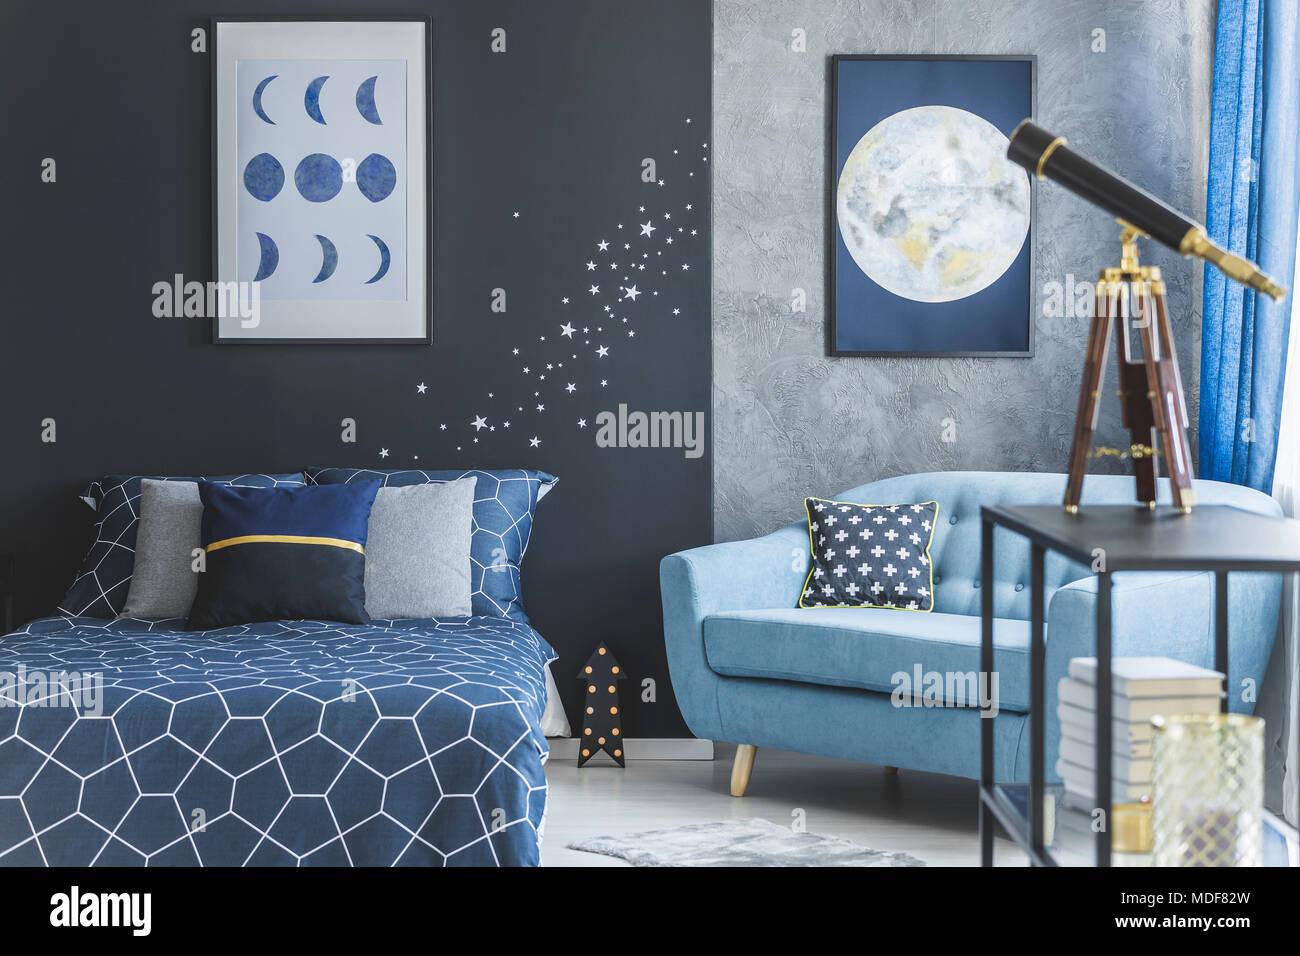 Türkisfarbene Sessel neben dem Bett gegen Marine blaue Wand in ...